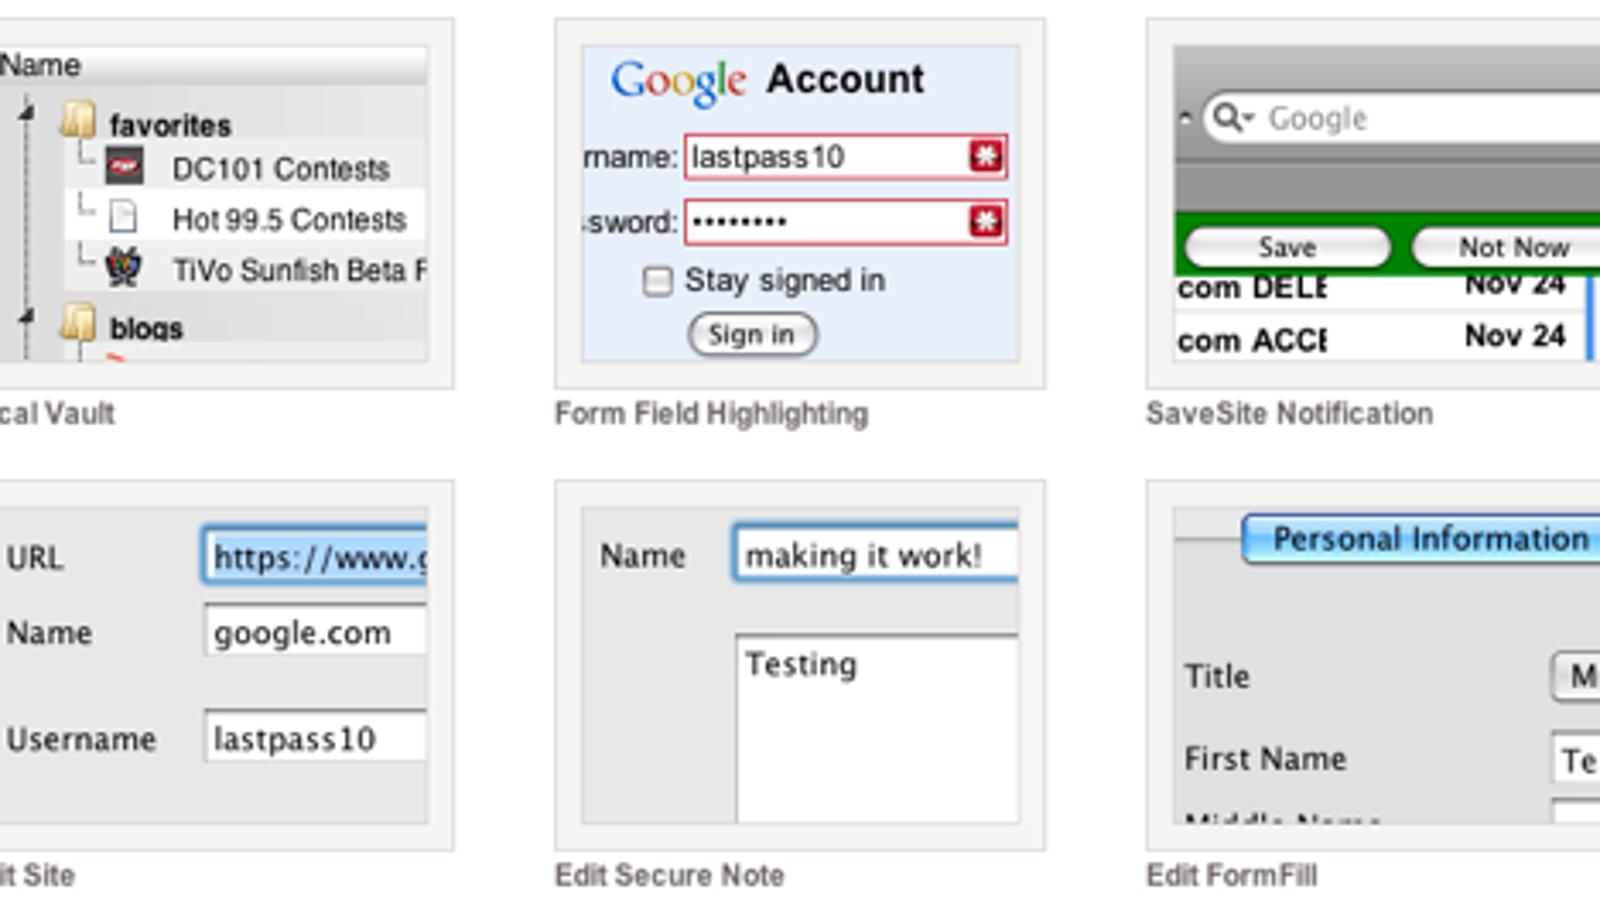 Install lastpass plugin ie | LastPass Forums • View topic